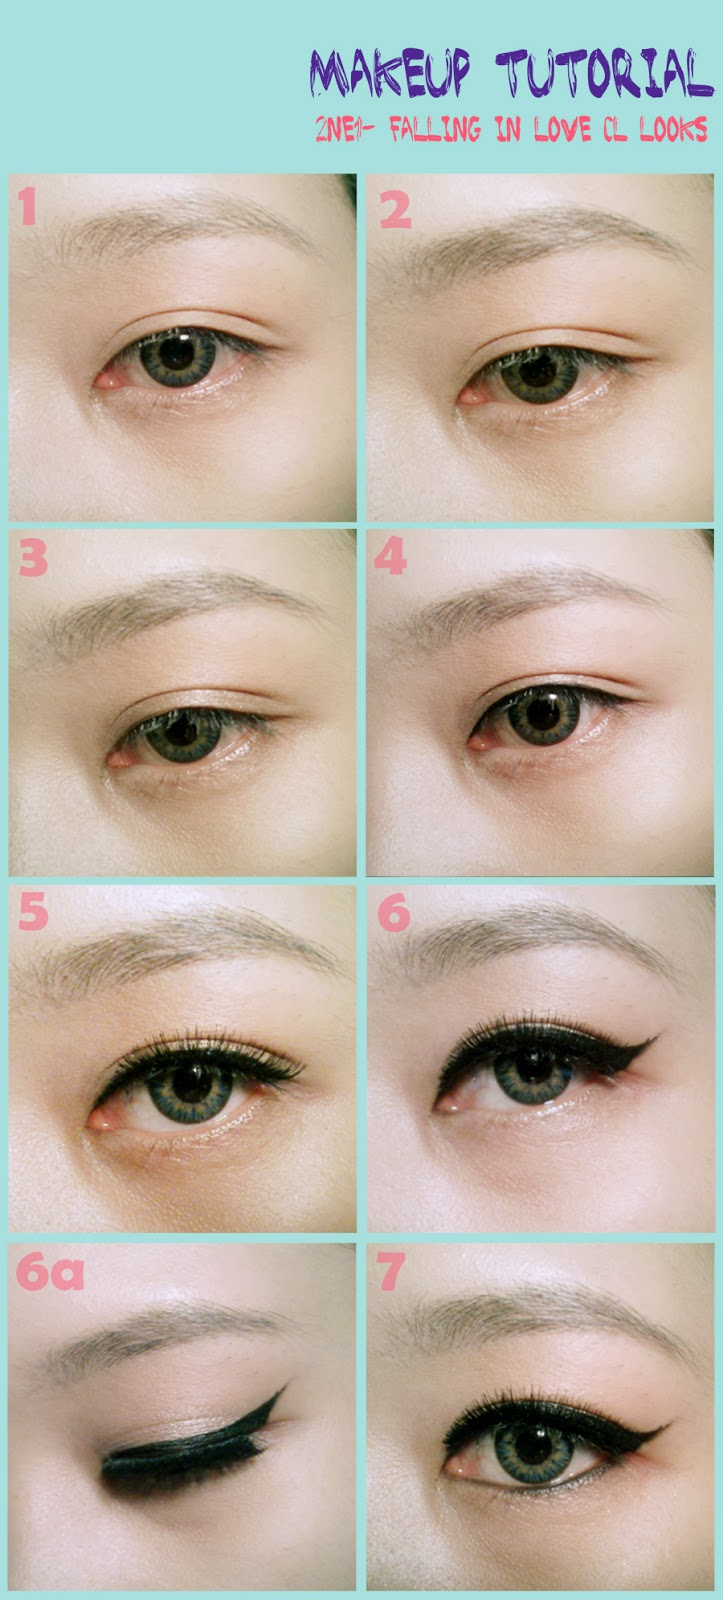 Eyeliner Tutorial: THESORBETJOURNEY: 2NE1 Falling In Love Makeup Tutorial